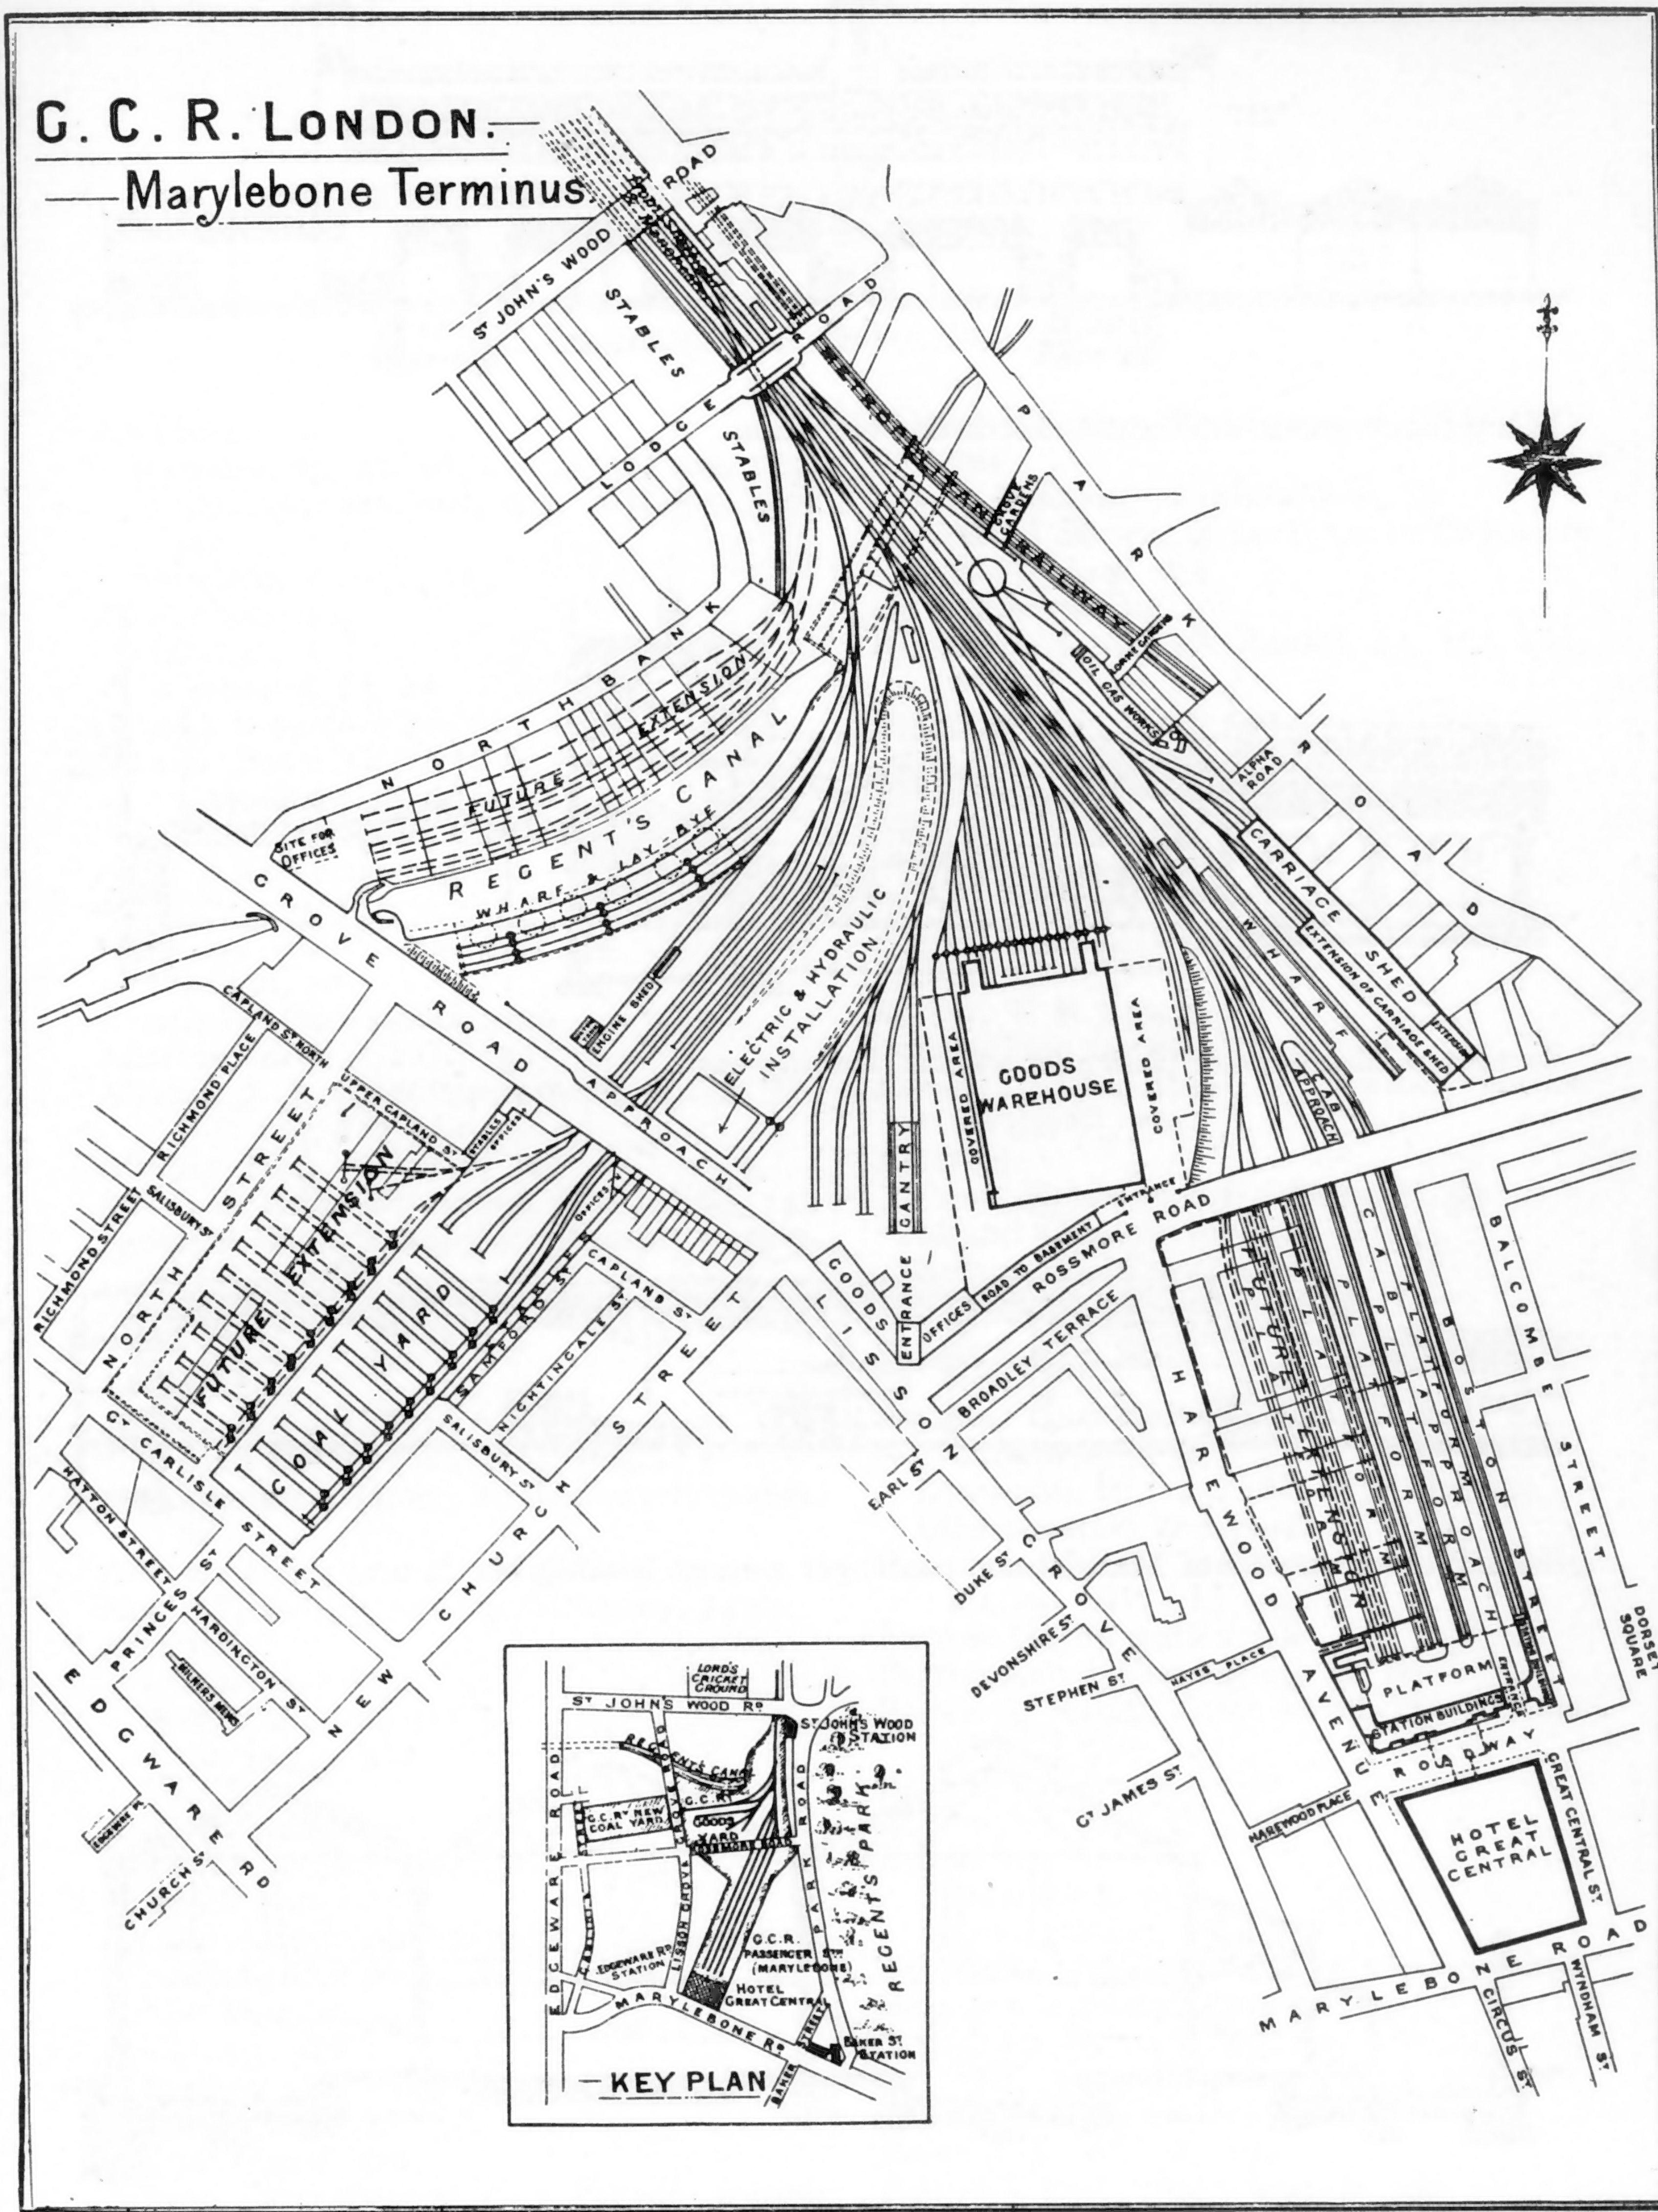 Bath Green Park Station Track Plans